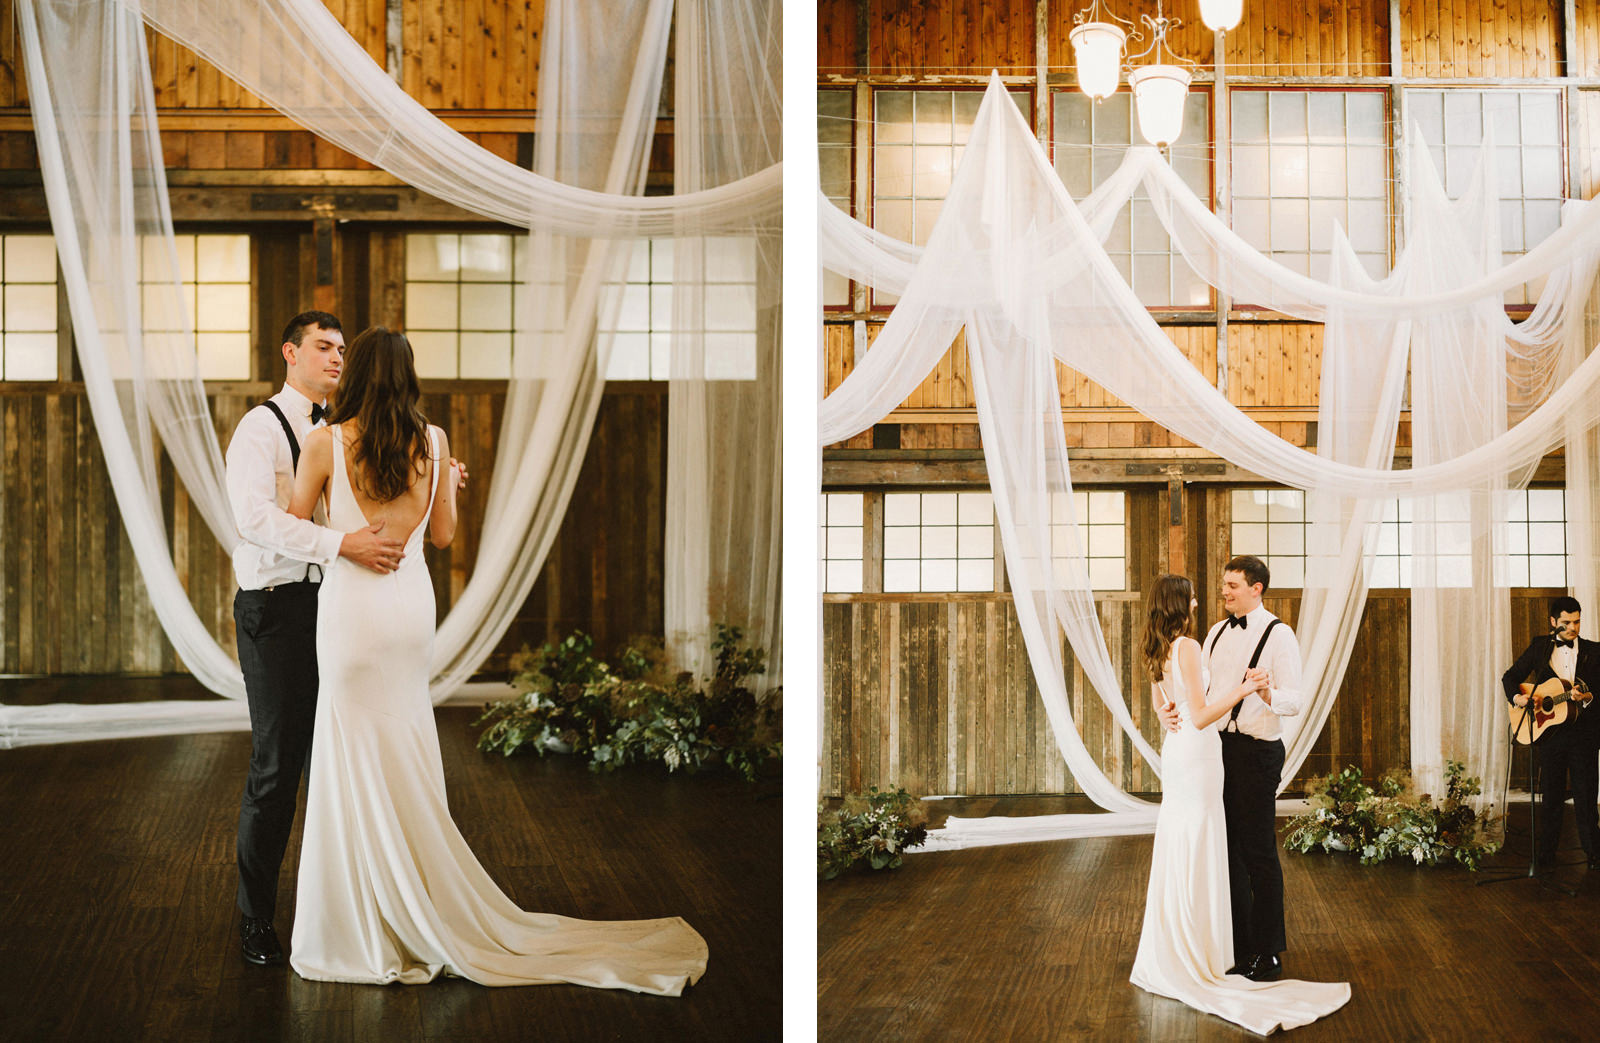 sodo-park-wedding-075 SODO PARK WEDDING